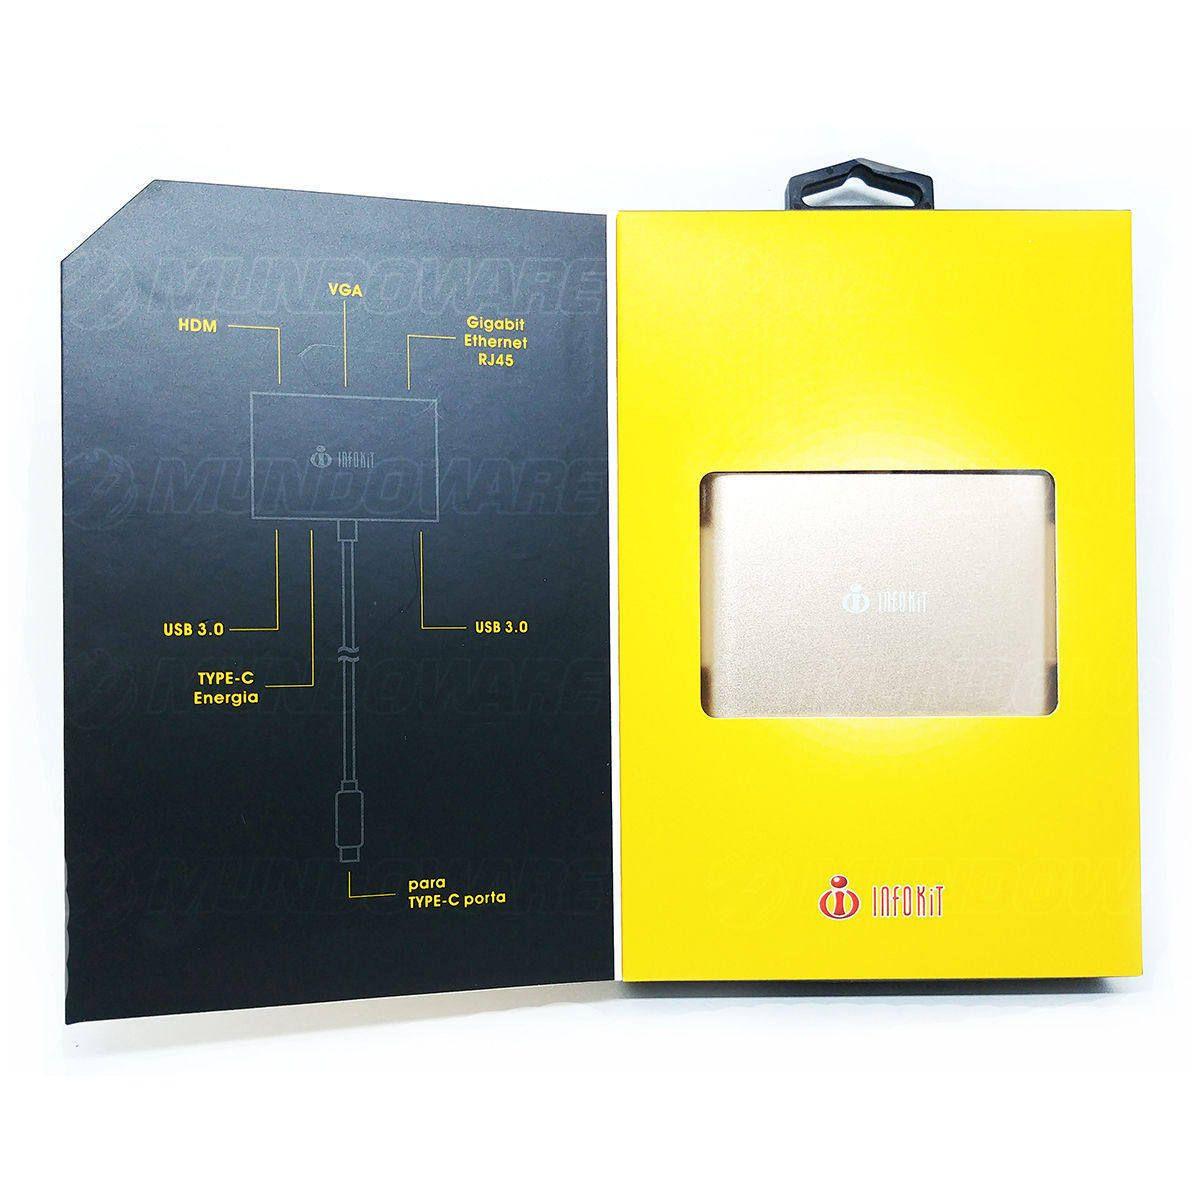 Adaptador Type-C para Notebook / Macbook 6 em 1 converte HDMI VGA USB 3.0 Type C Fêmea RJ45 Gigabit Infokit TCE-RCNB106